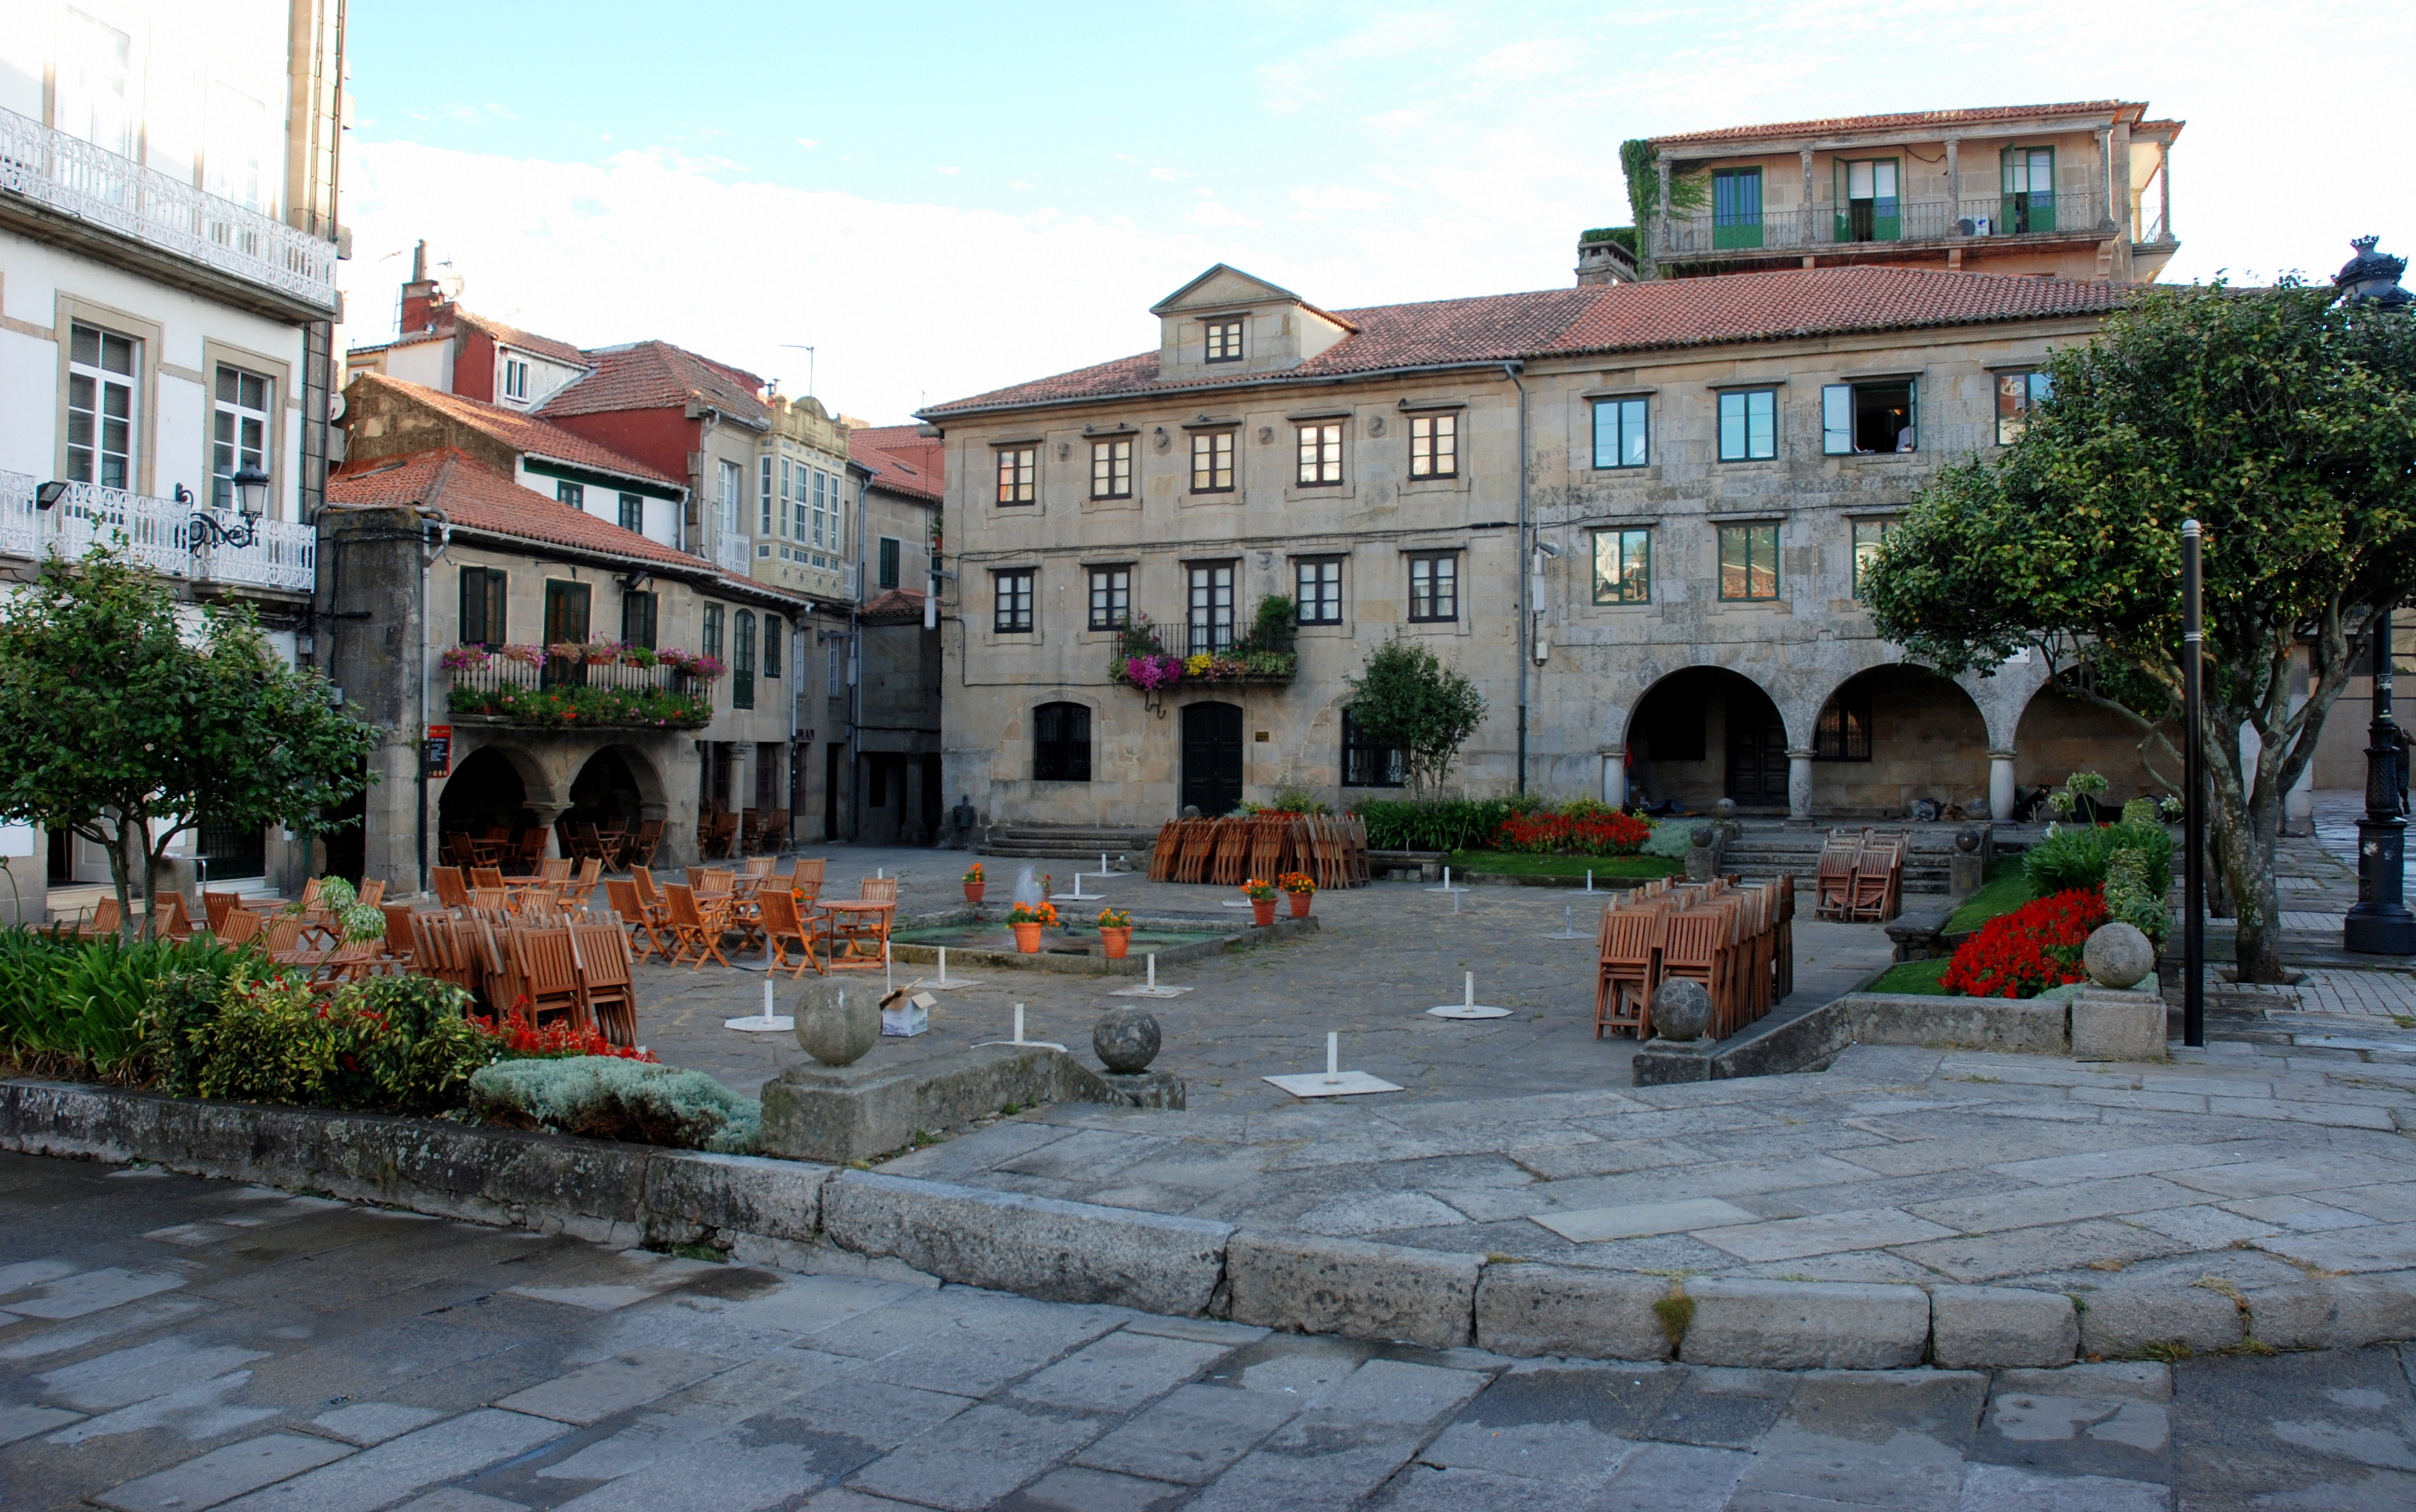 Pontevedra_16026